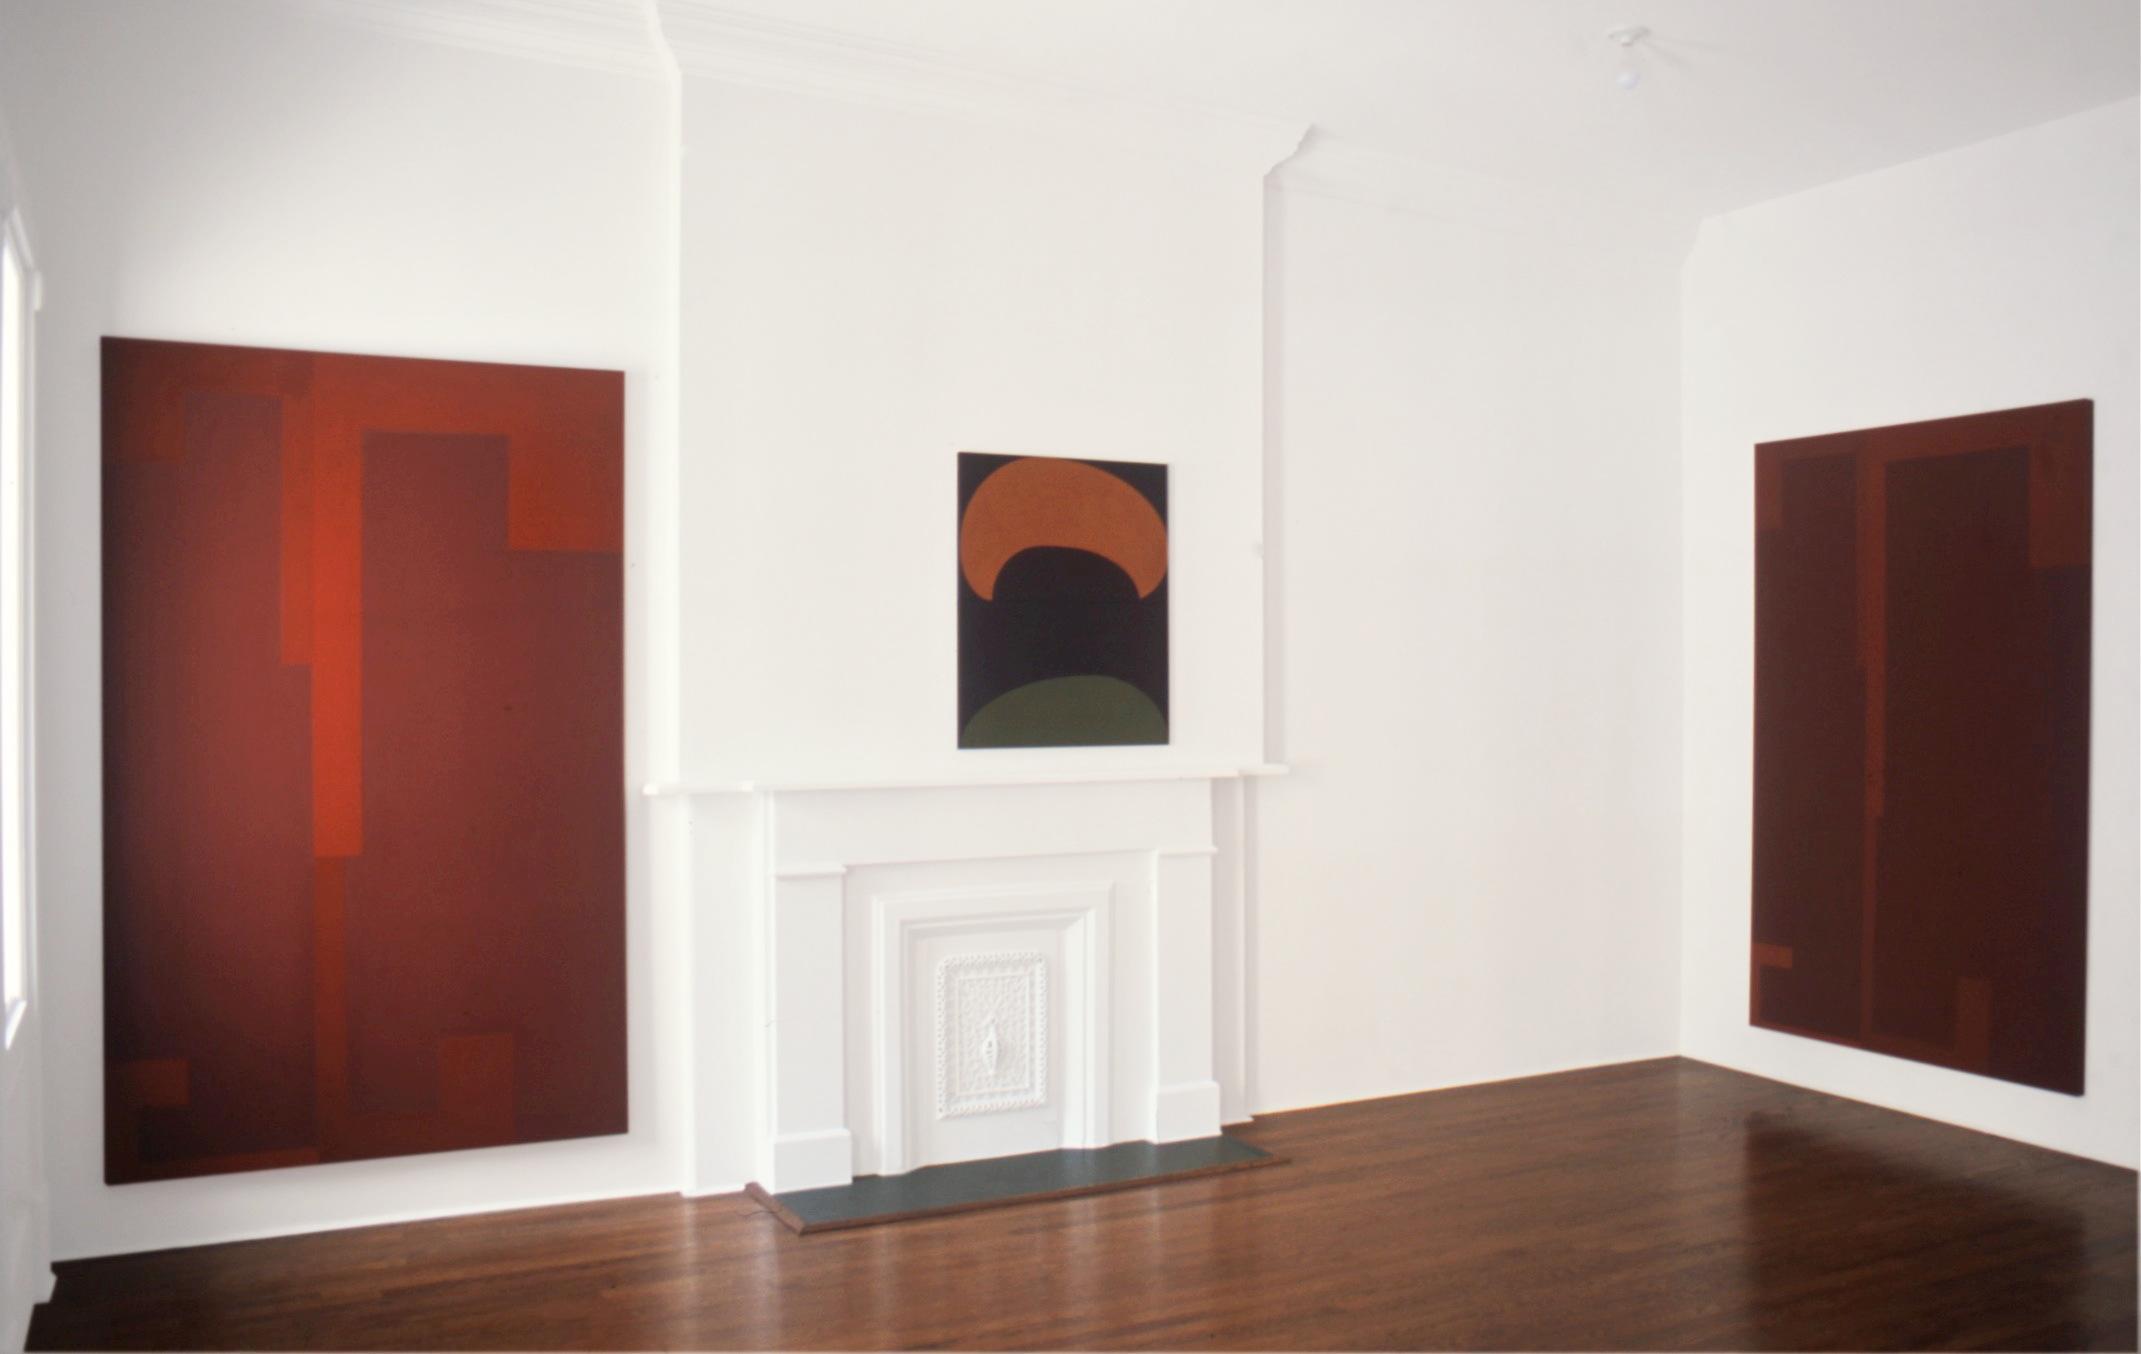 Suzan Frecon at Lawrence Markey 2003.jpeg